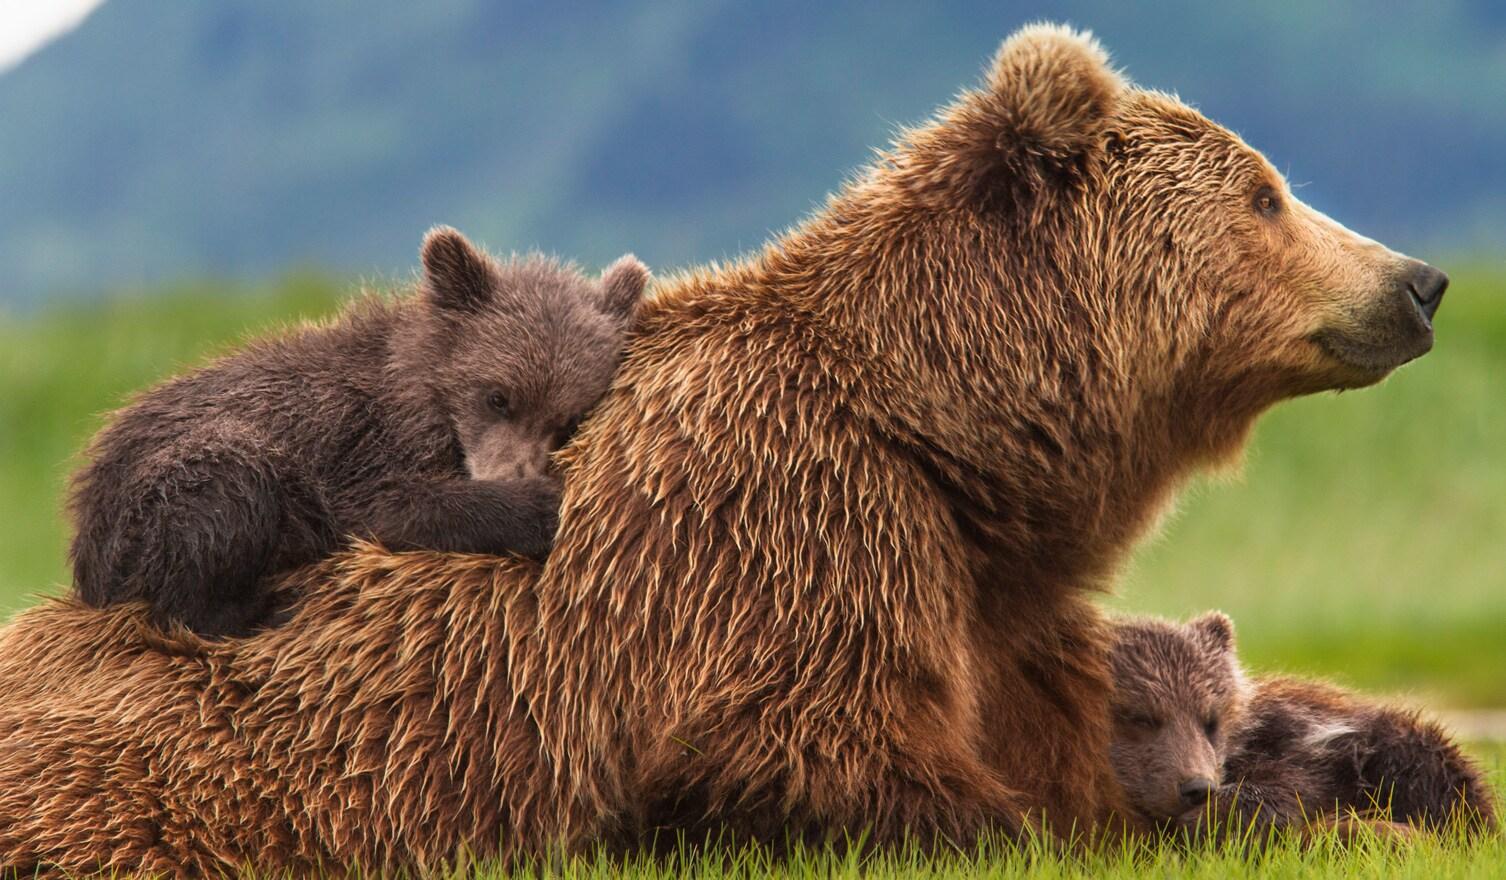 Staying Safe around Bears - Bears (U.S. National Park Service)